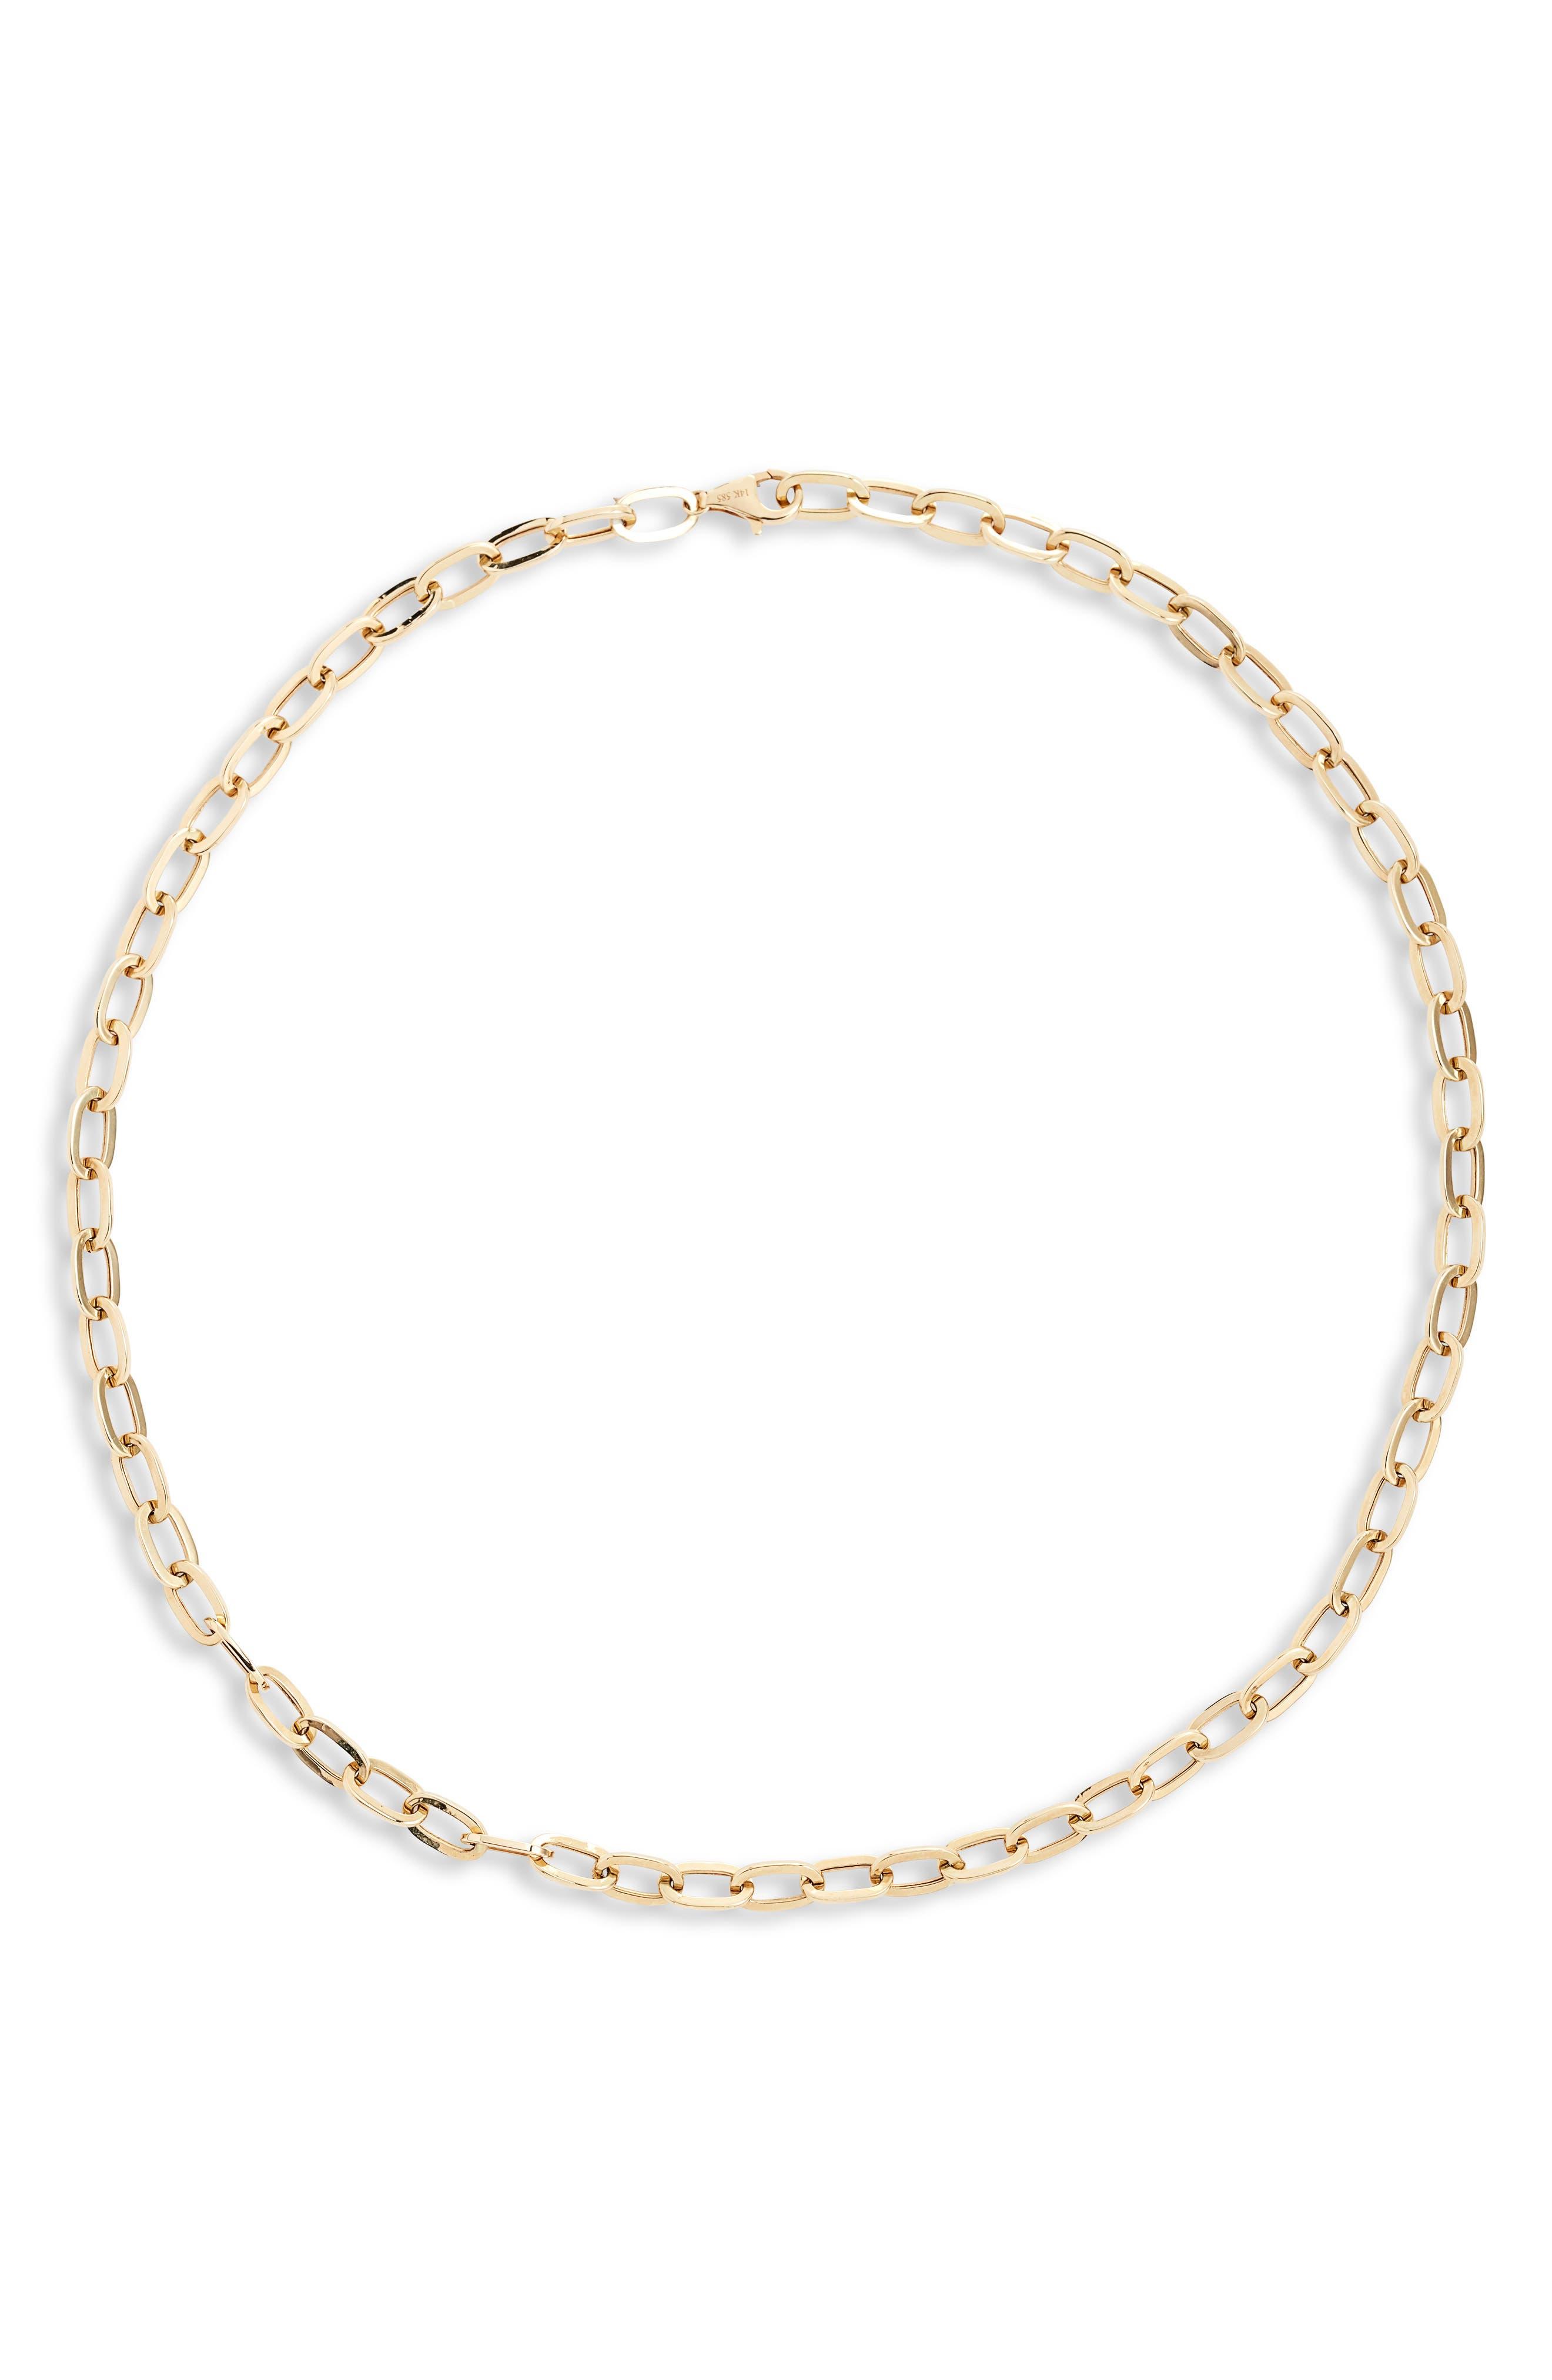 Jumbo Link 14K Gold Necklace